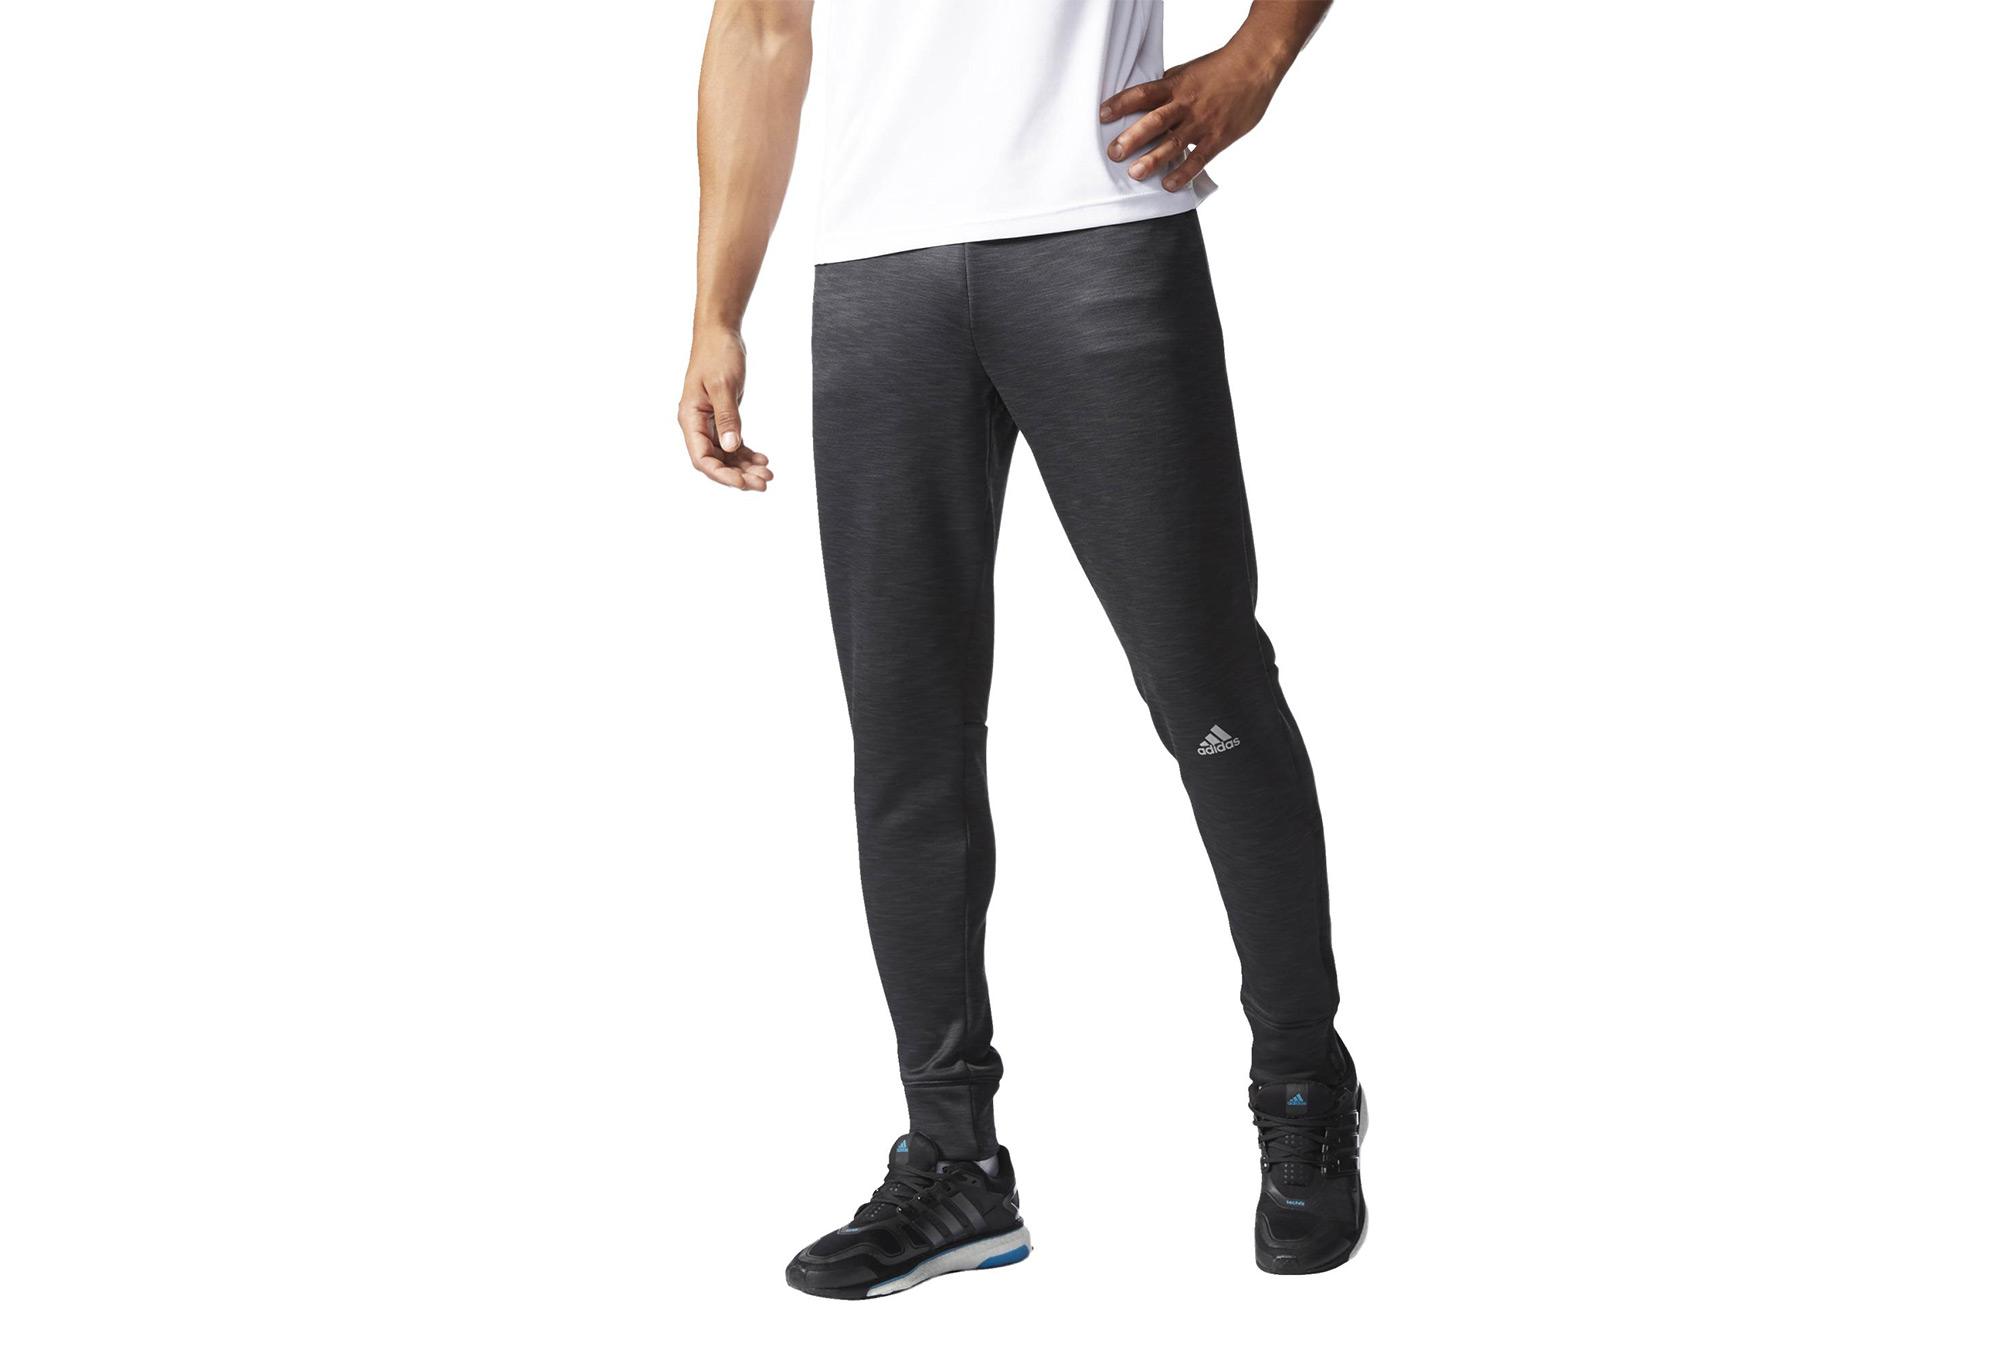 Sequencials Climaheat Adidas Pantalon Homme Noir 8OPwk0NnXZ